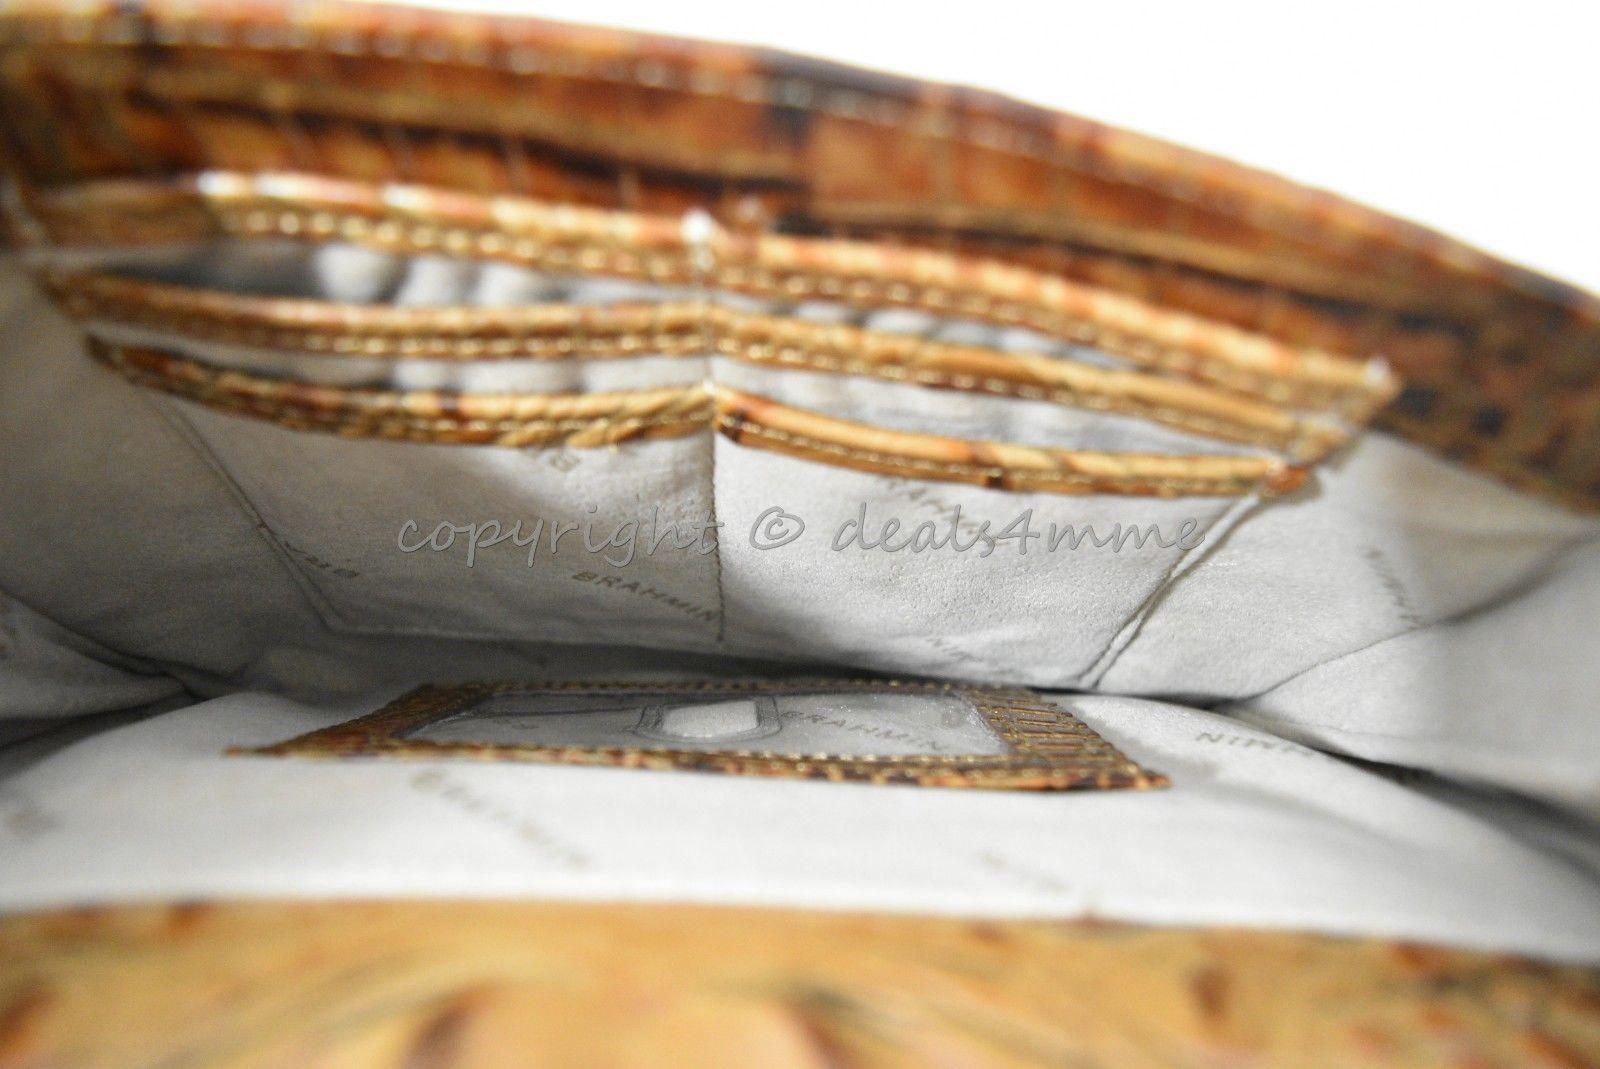 NWT Brahmin Manhattan Leather Shoulder/Crossbody Bag in Toasted Almond Melbourne image 7